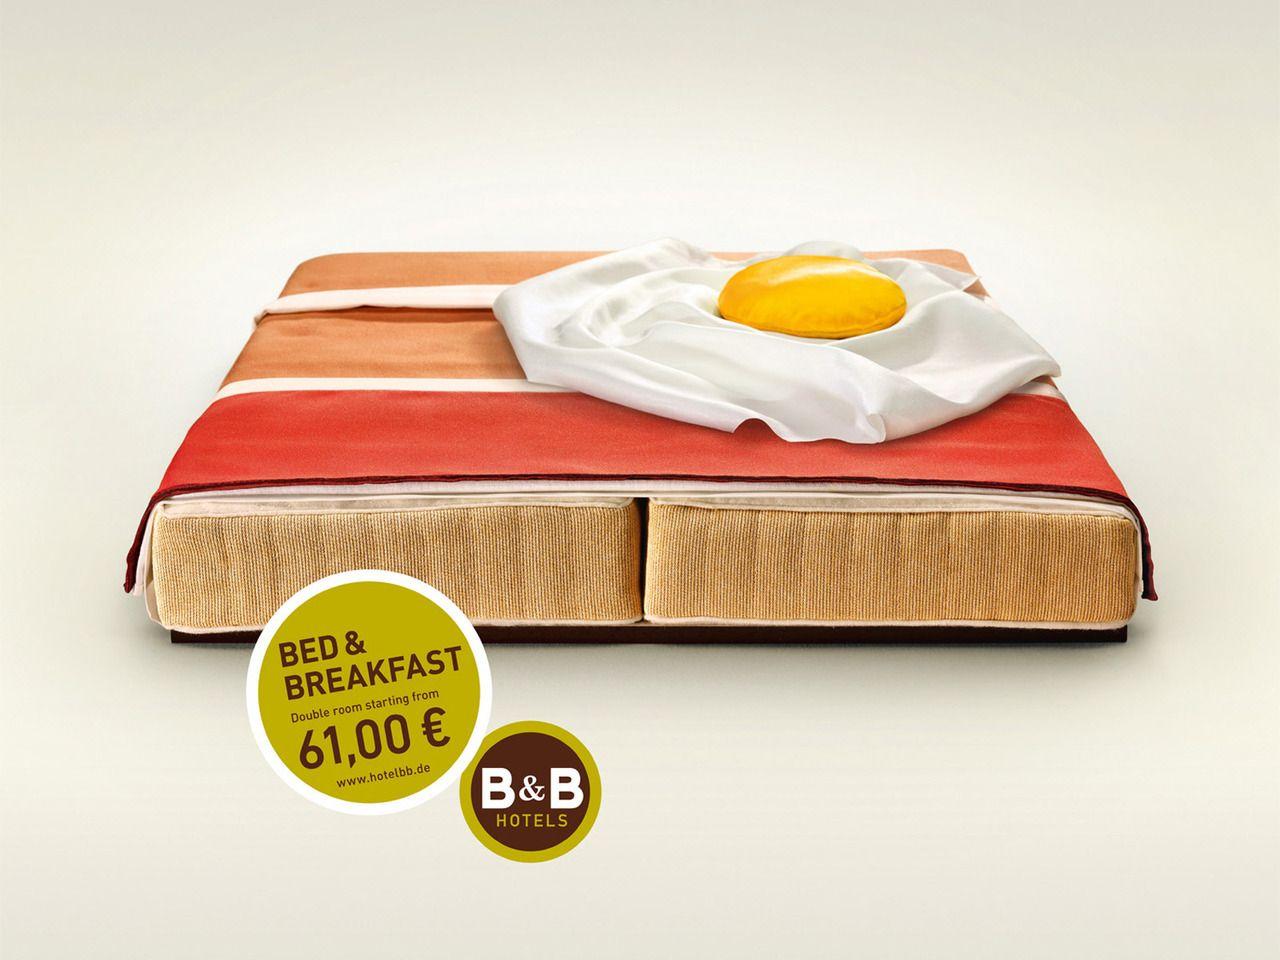 L196_______o.O, izmia: Creative B Hotels Advertisement -...